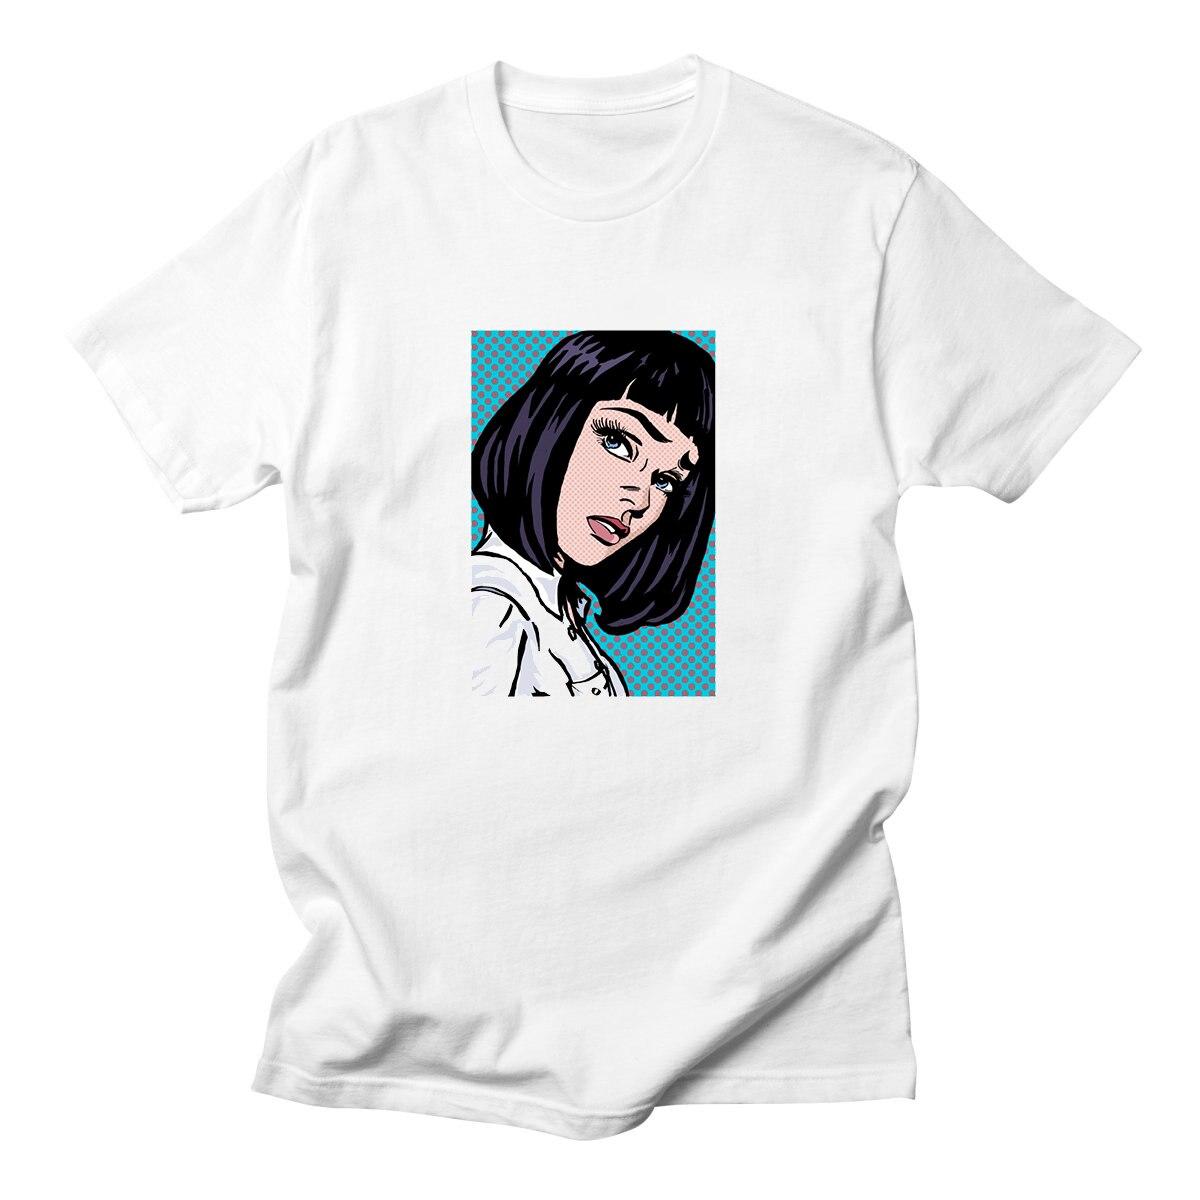 voltreffer-mia-funny-t-shirt-2018-movie-pulp-fiction-quentin-font-b-tarantino-b-font-t-shirt-streetwear-100-cotton-casual-top-tee